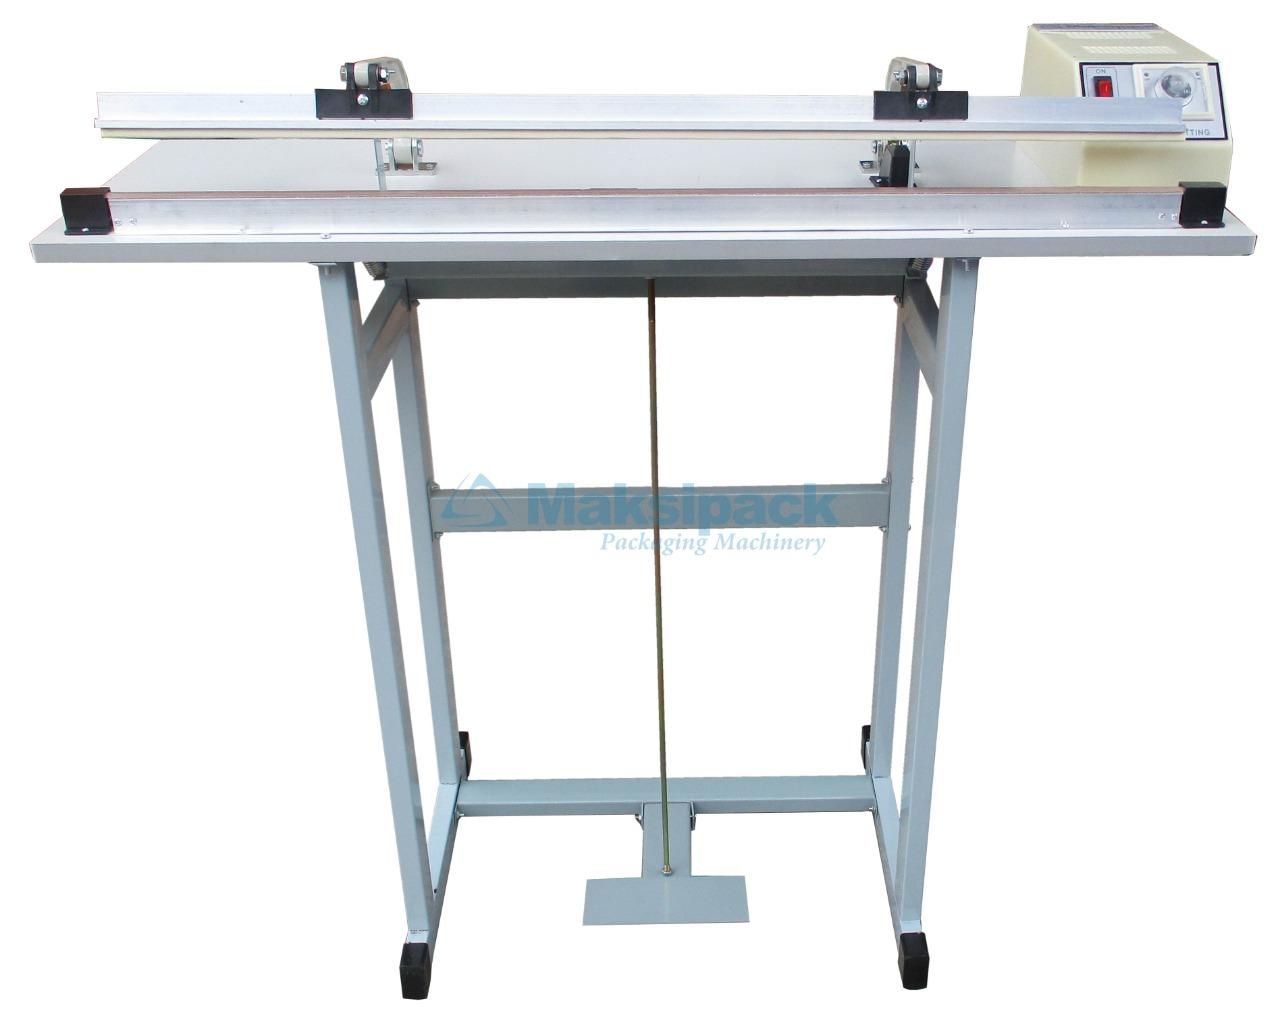 Mesin Sealer Plastik Pedal Sealer FRP-1000